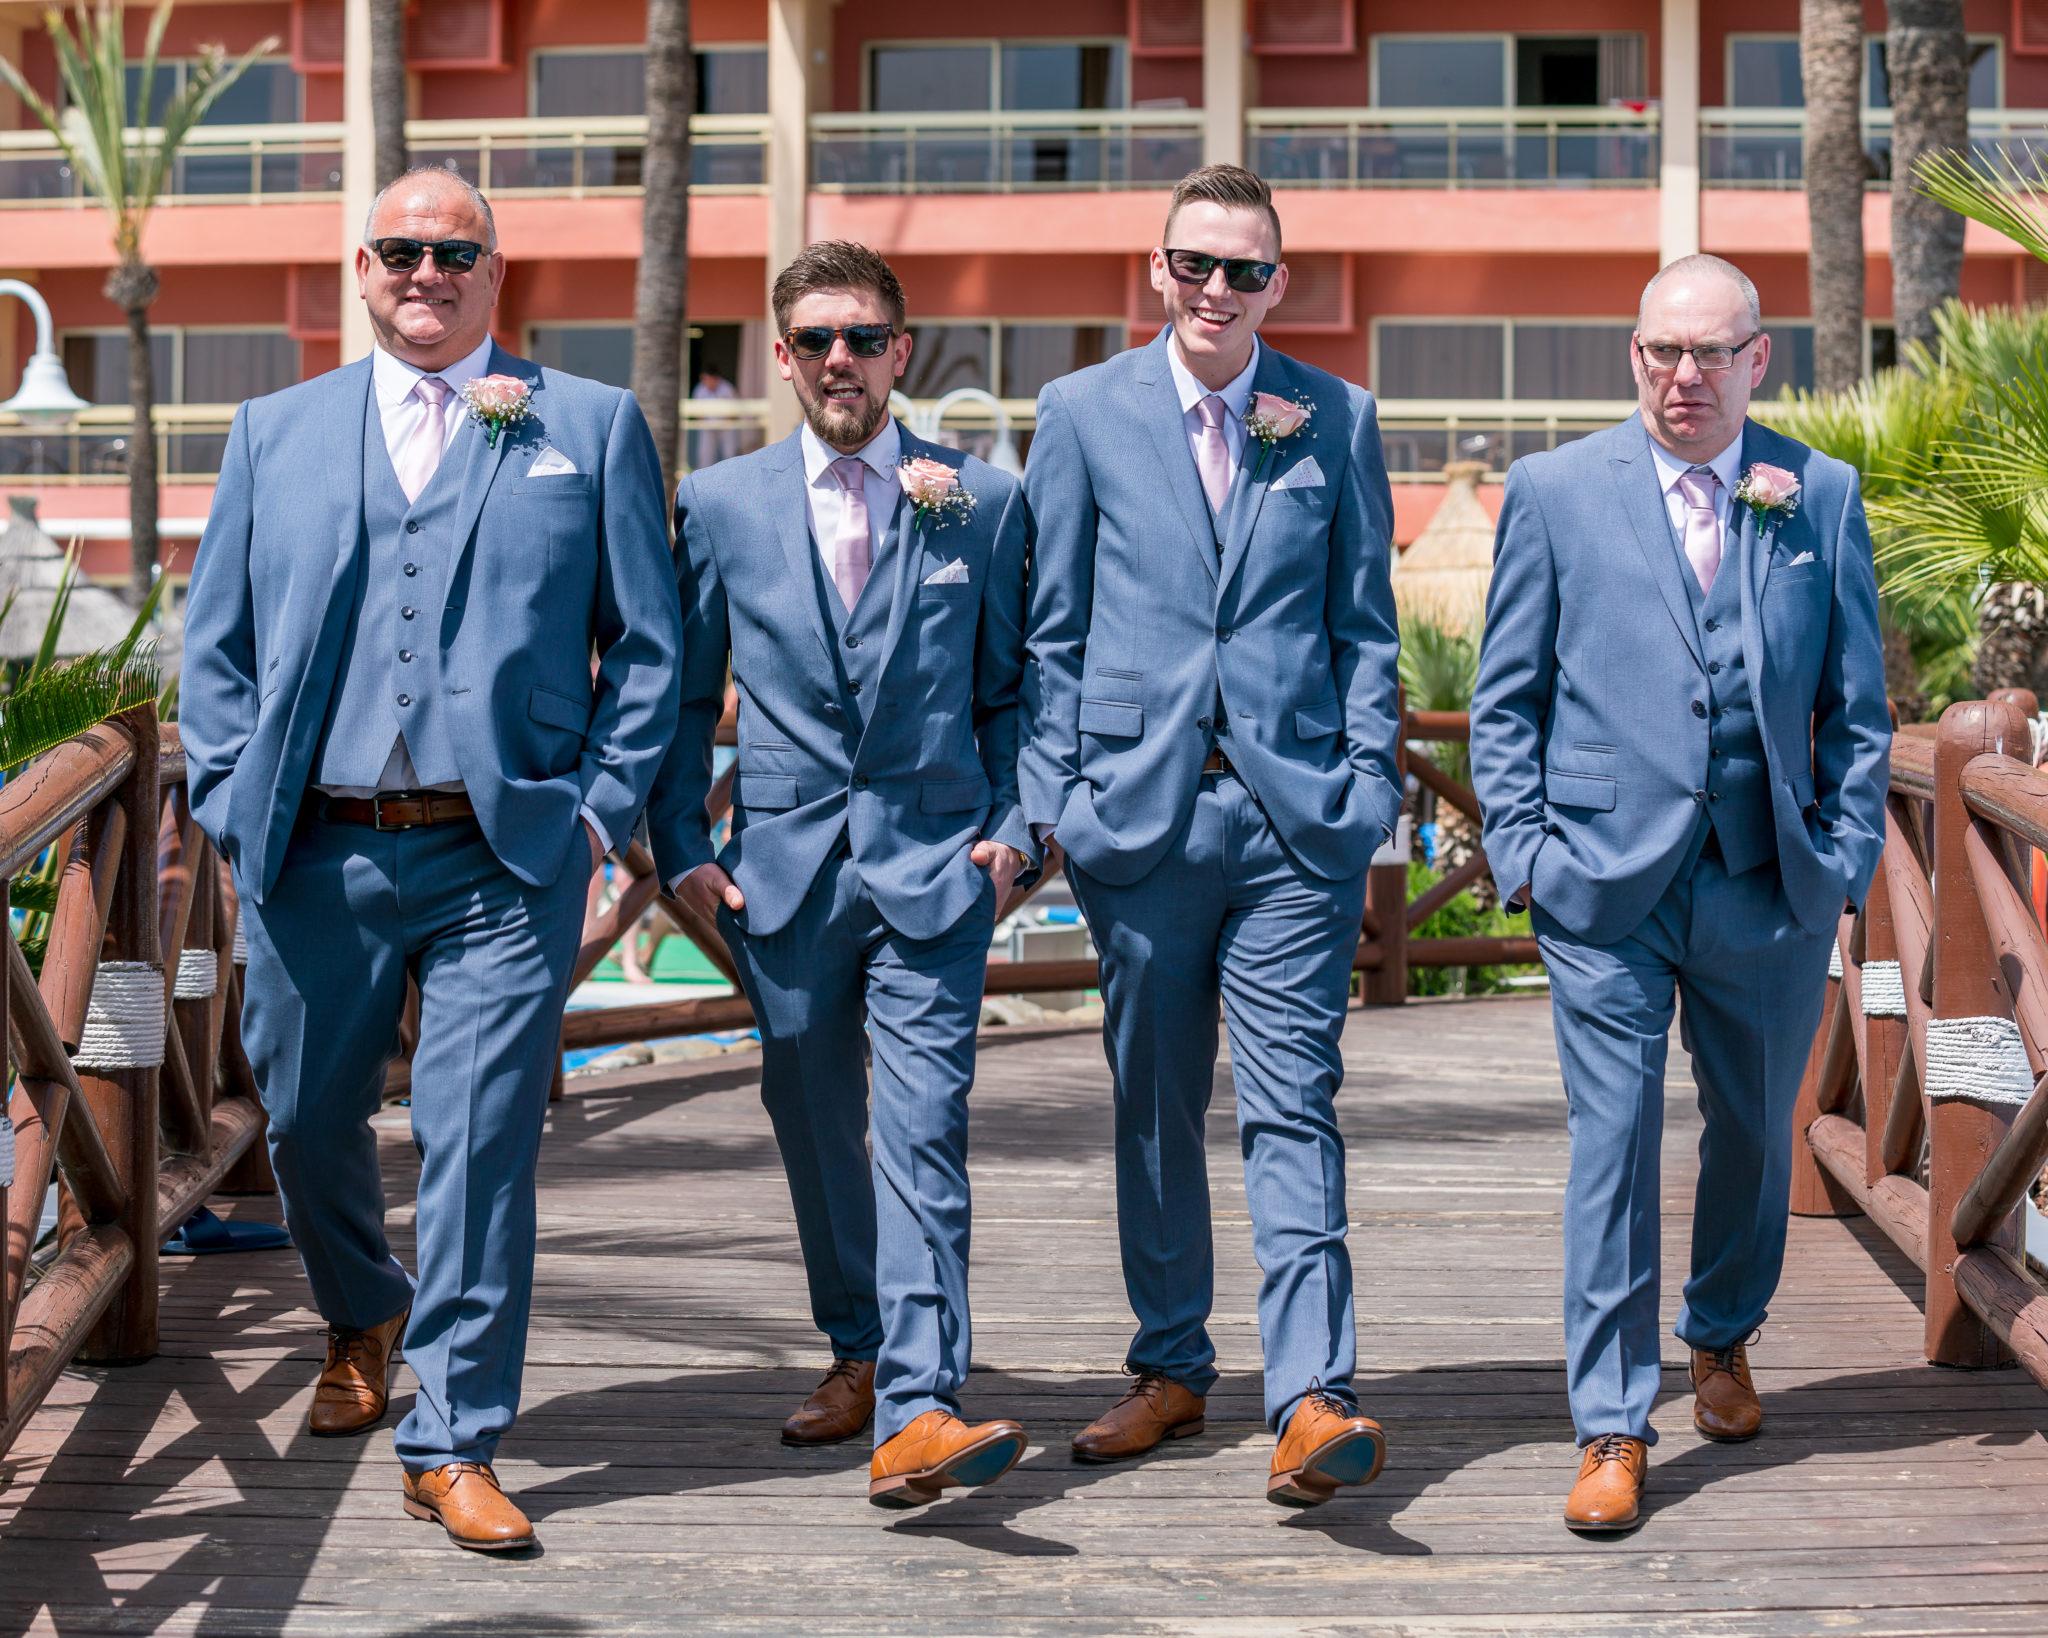 Groom & Groomsmen at Sunset Beach Club Wedding